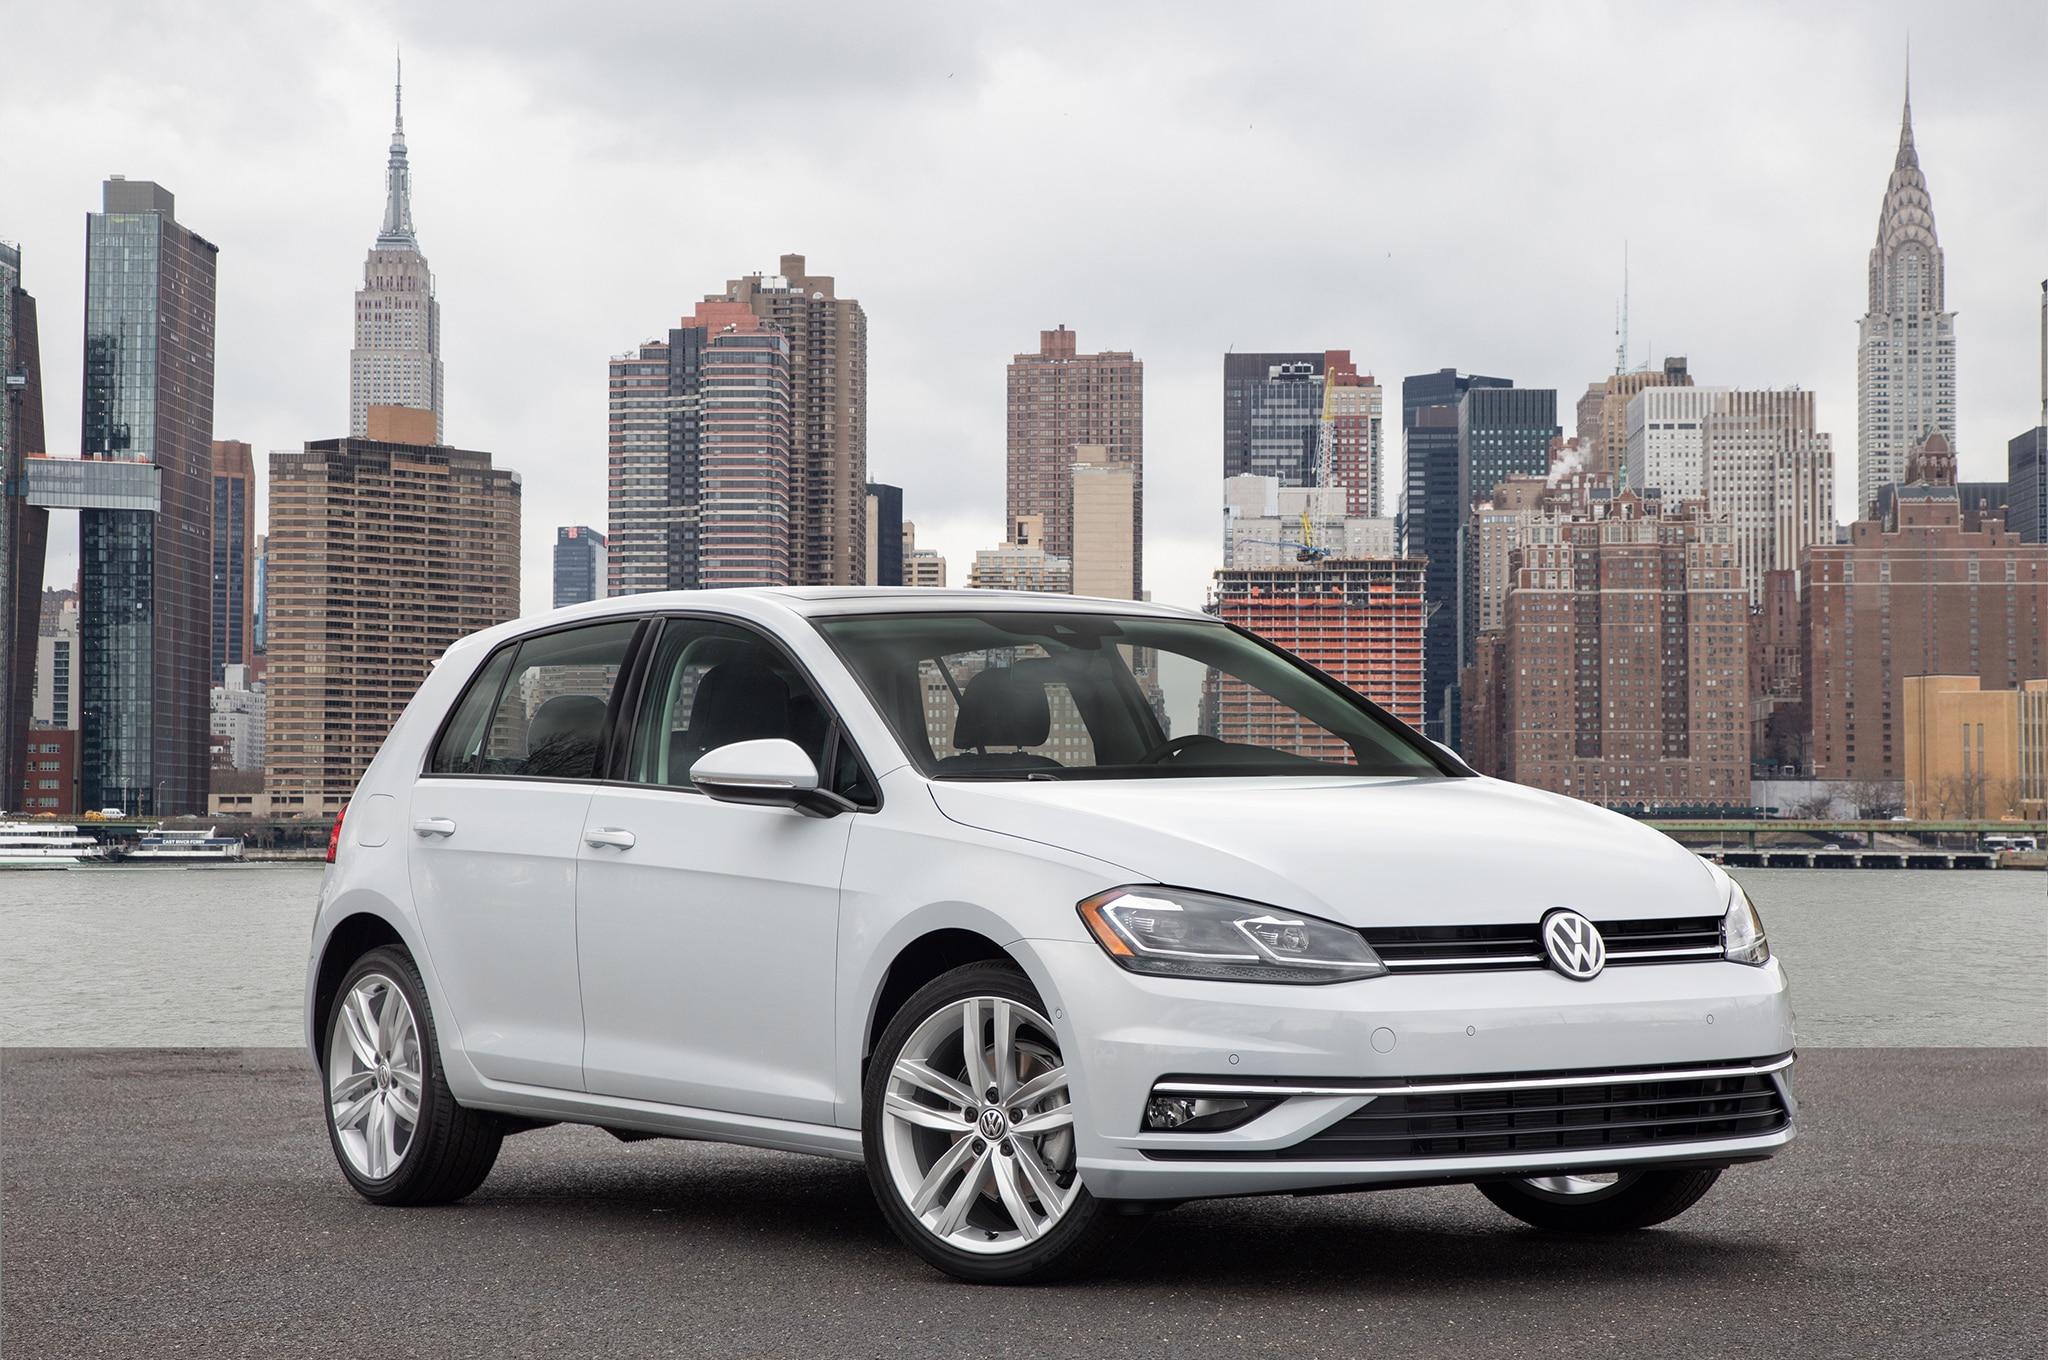 2018-Volkswagen-Golf-front-three-quarter-1